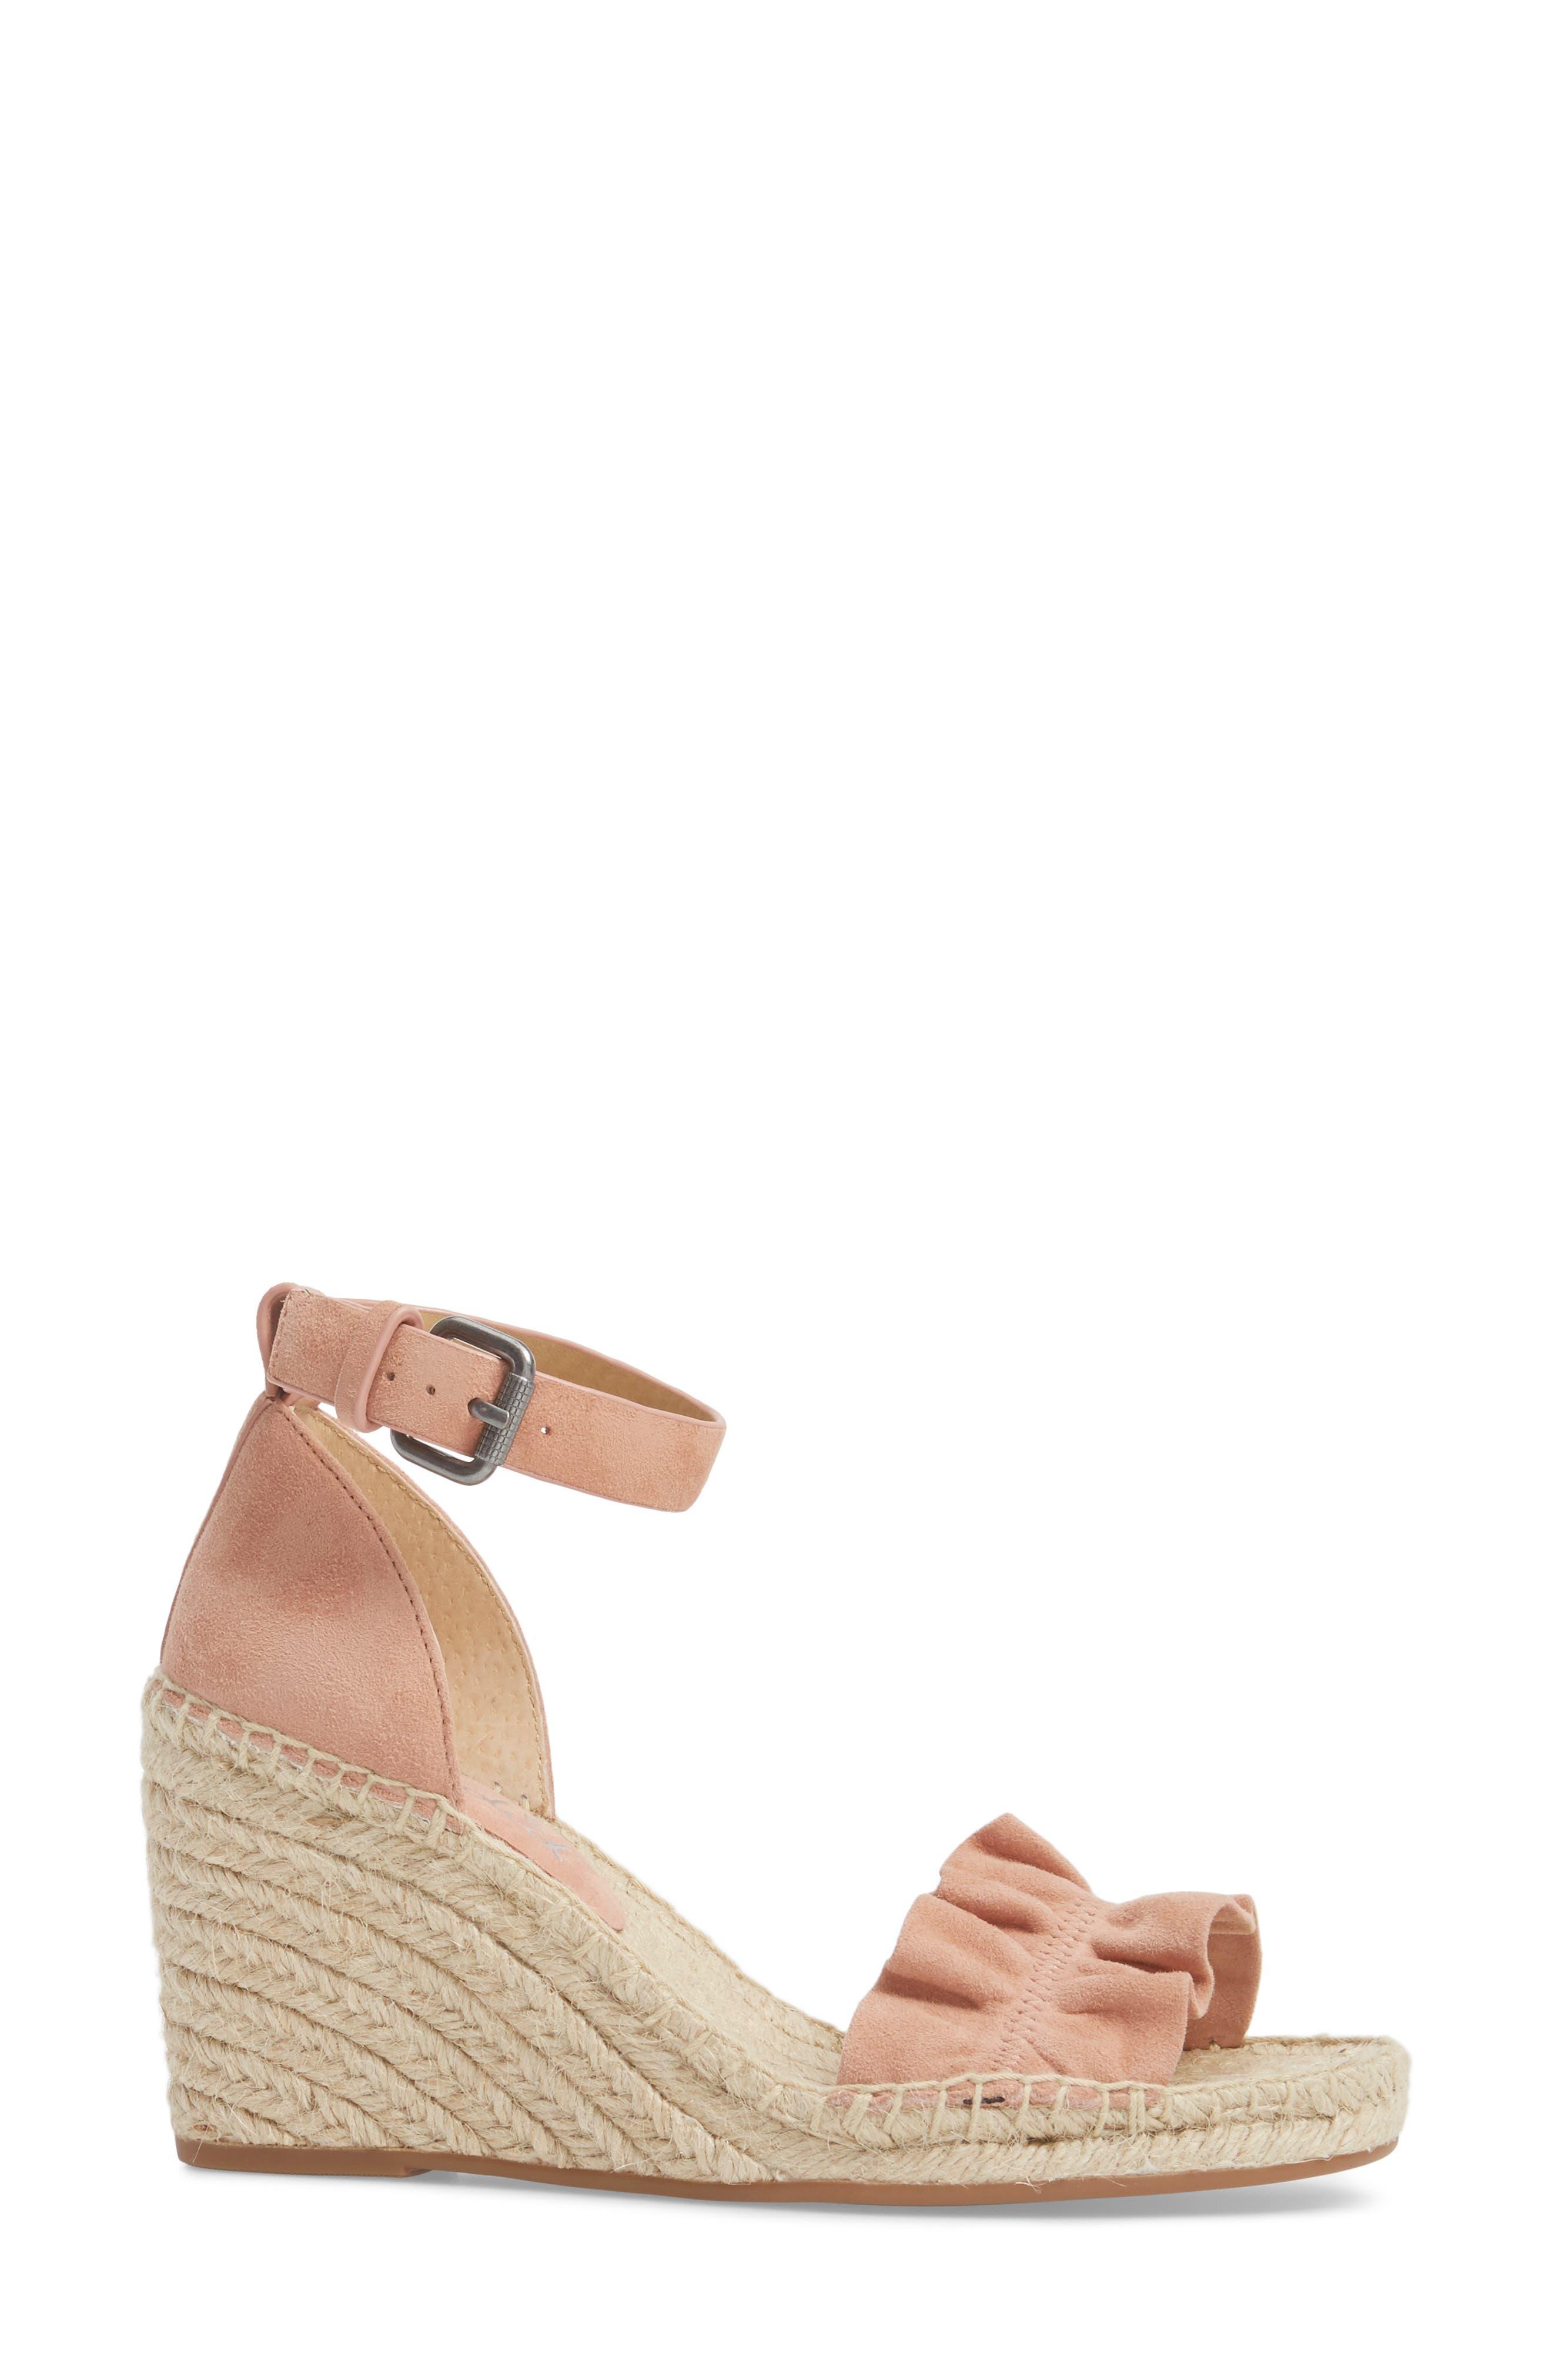 Bedford Espadrille Wedge Sandal,                             Alternate thumbnail 3, color,                             Dark Blush Suede